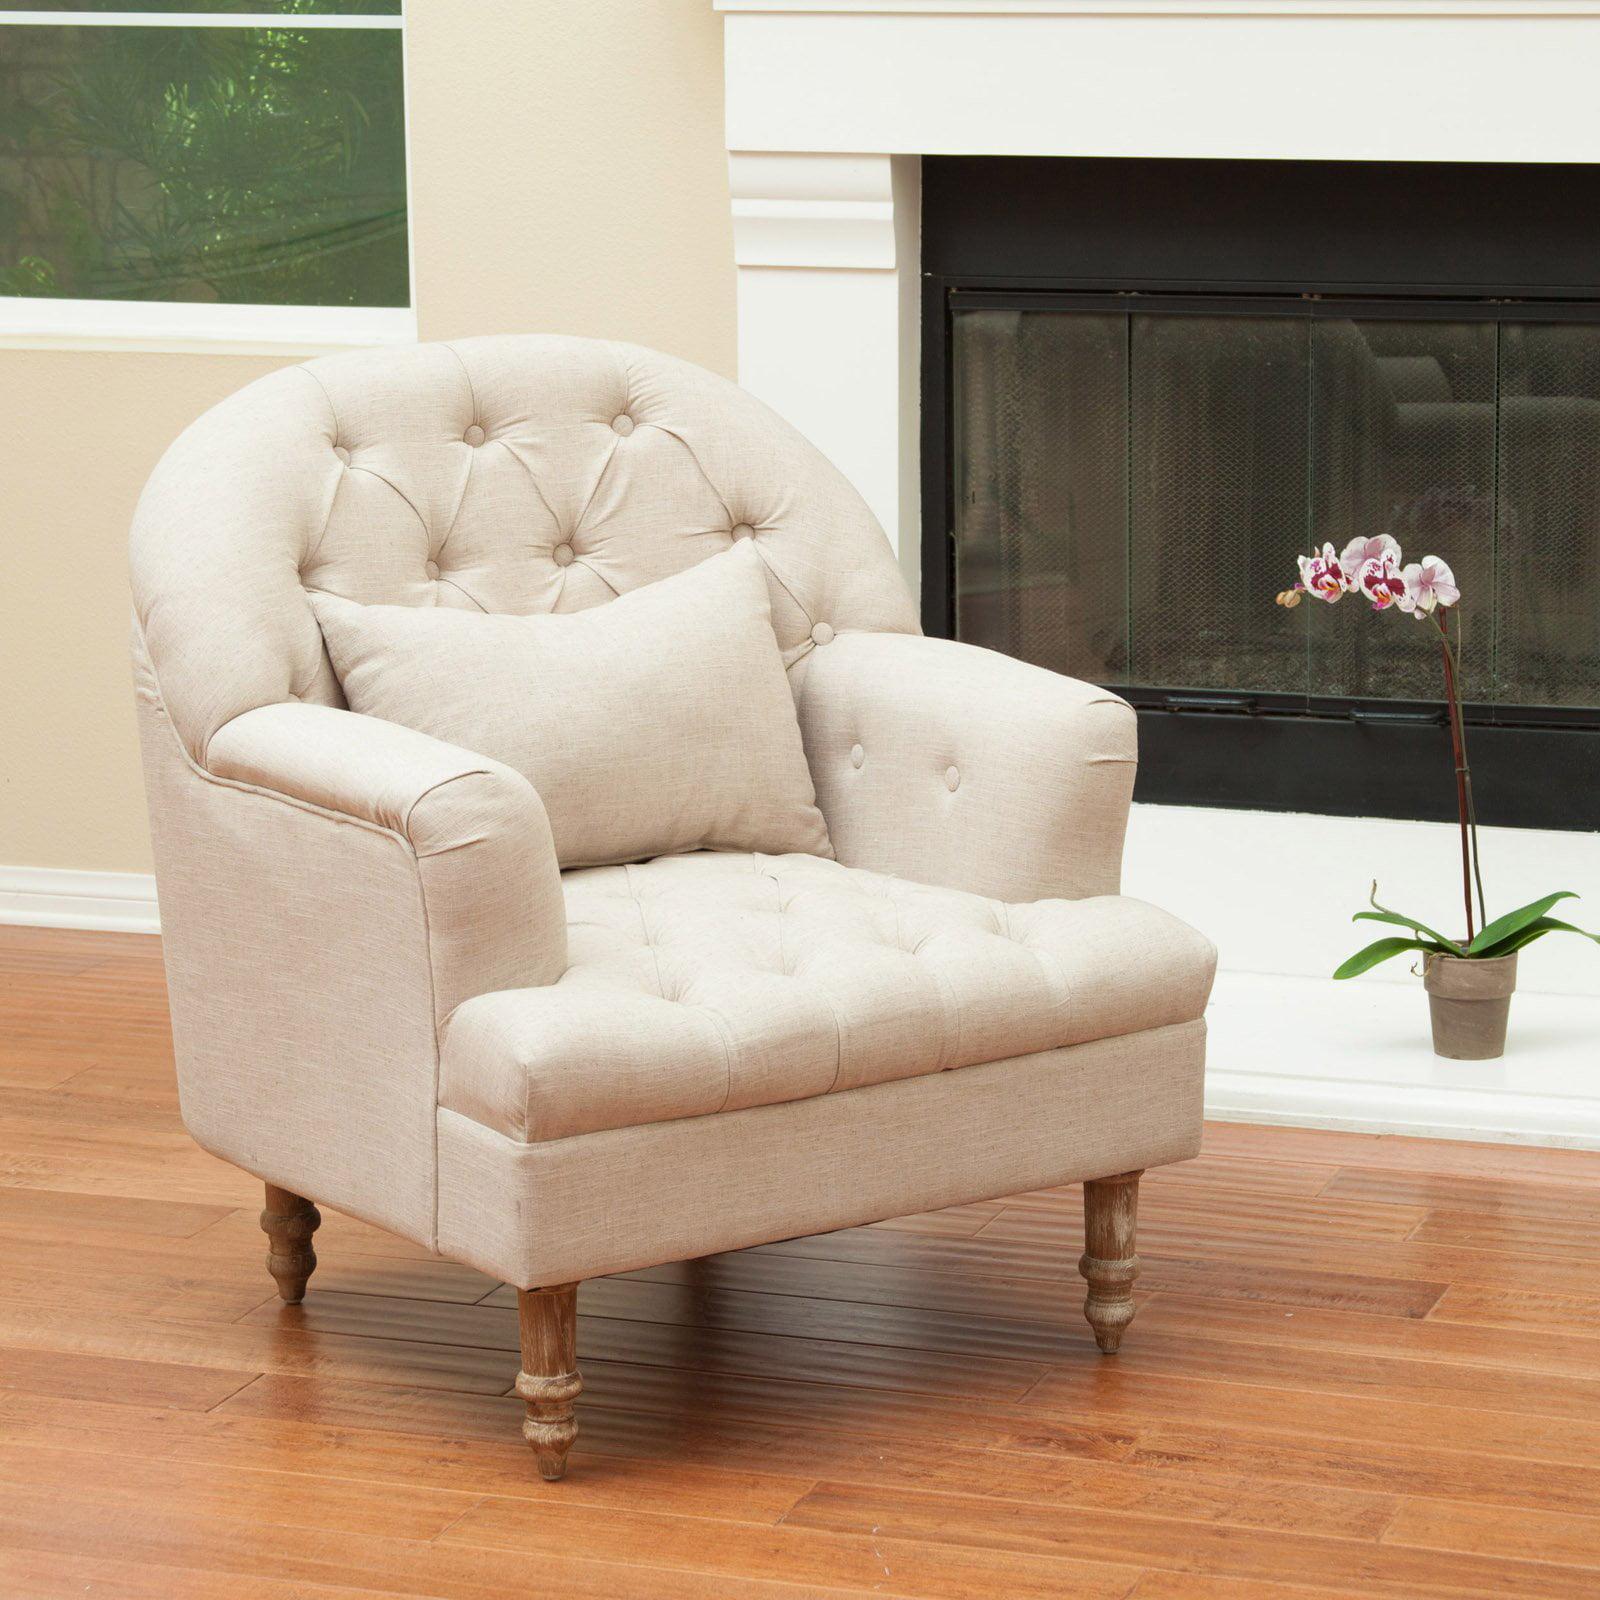 Best Selling Home Decor Furniture Ronnie Club Chair